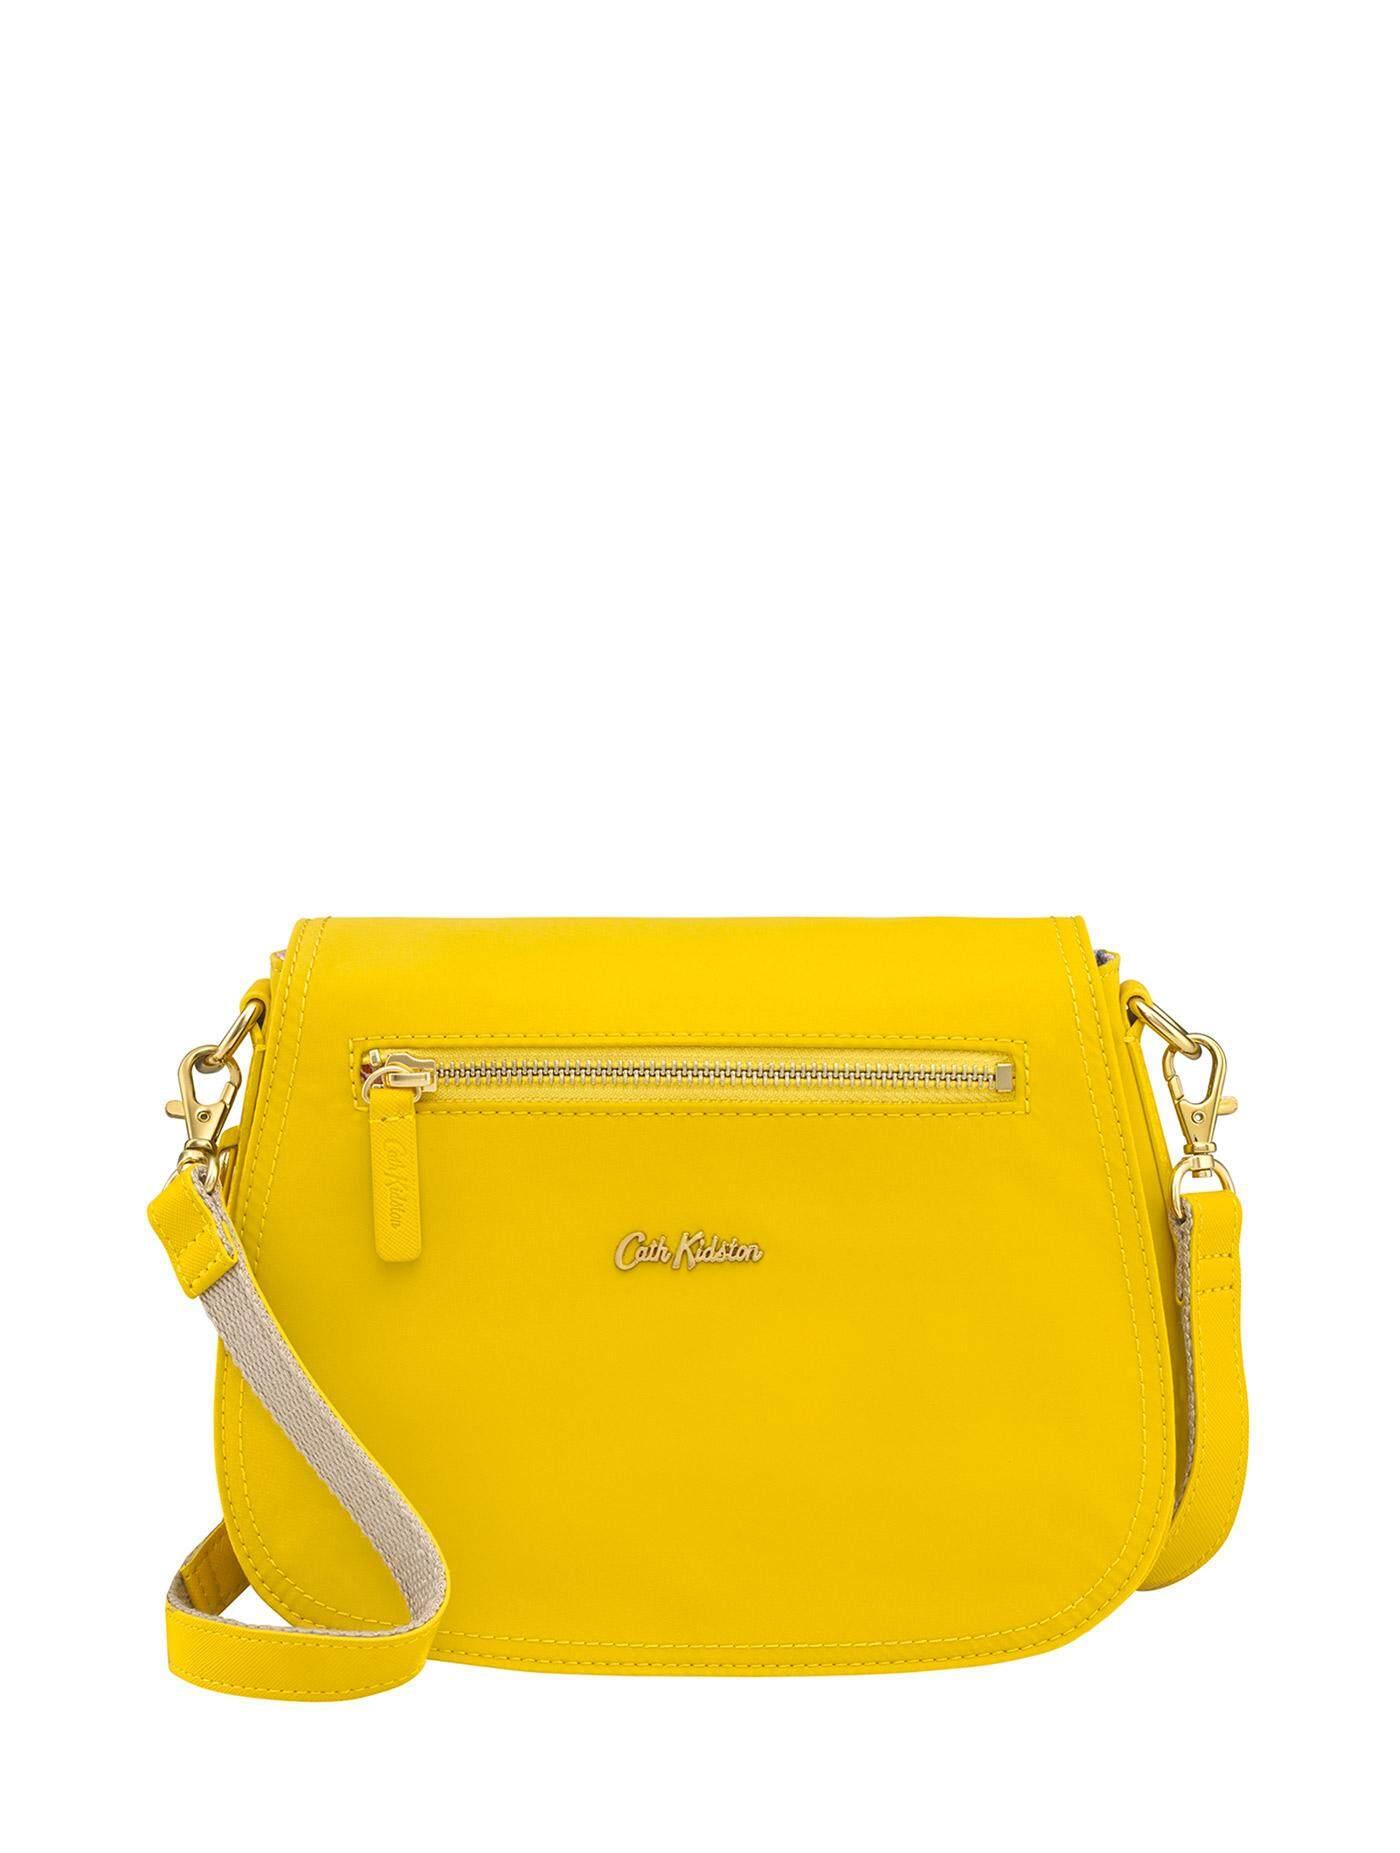 Cath Kidston กระเป๋าสะพาย รุ่น Bennett สีSolid Yellow